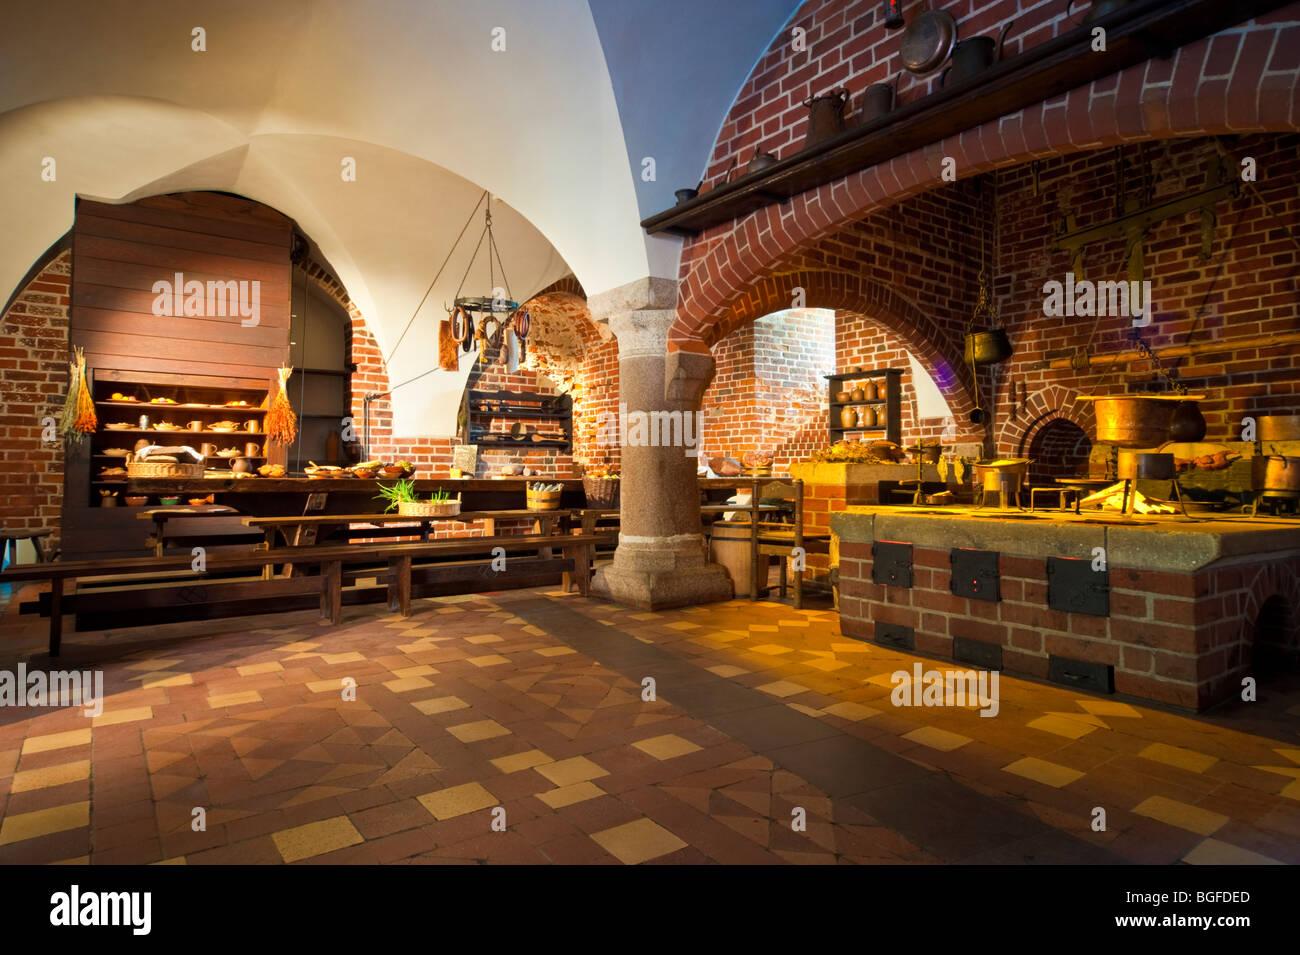 Kitchen In Teutonic Knights Castle Malbork Nogat River